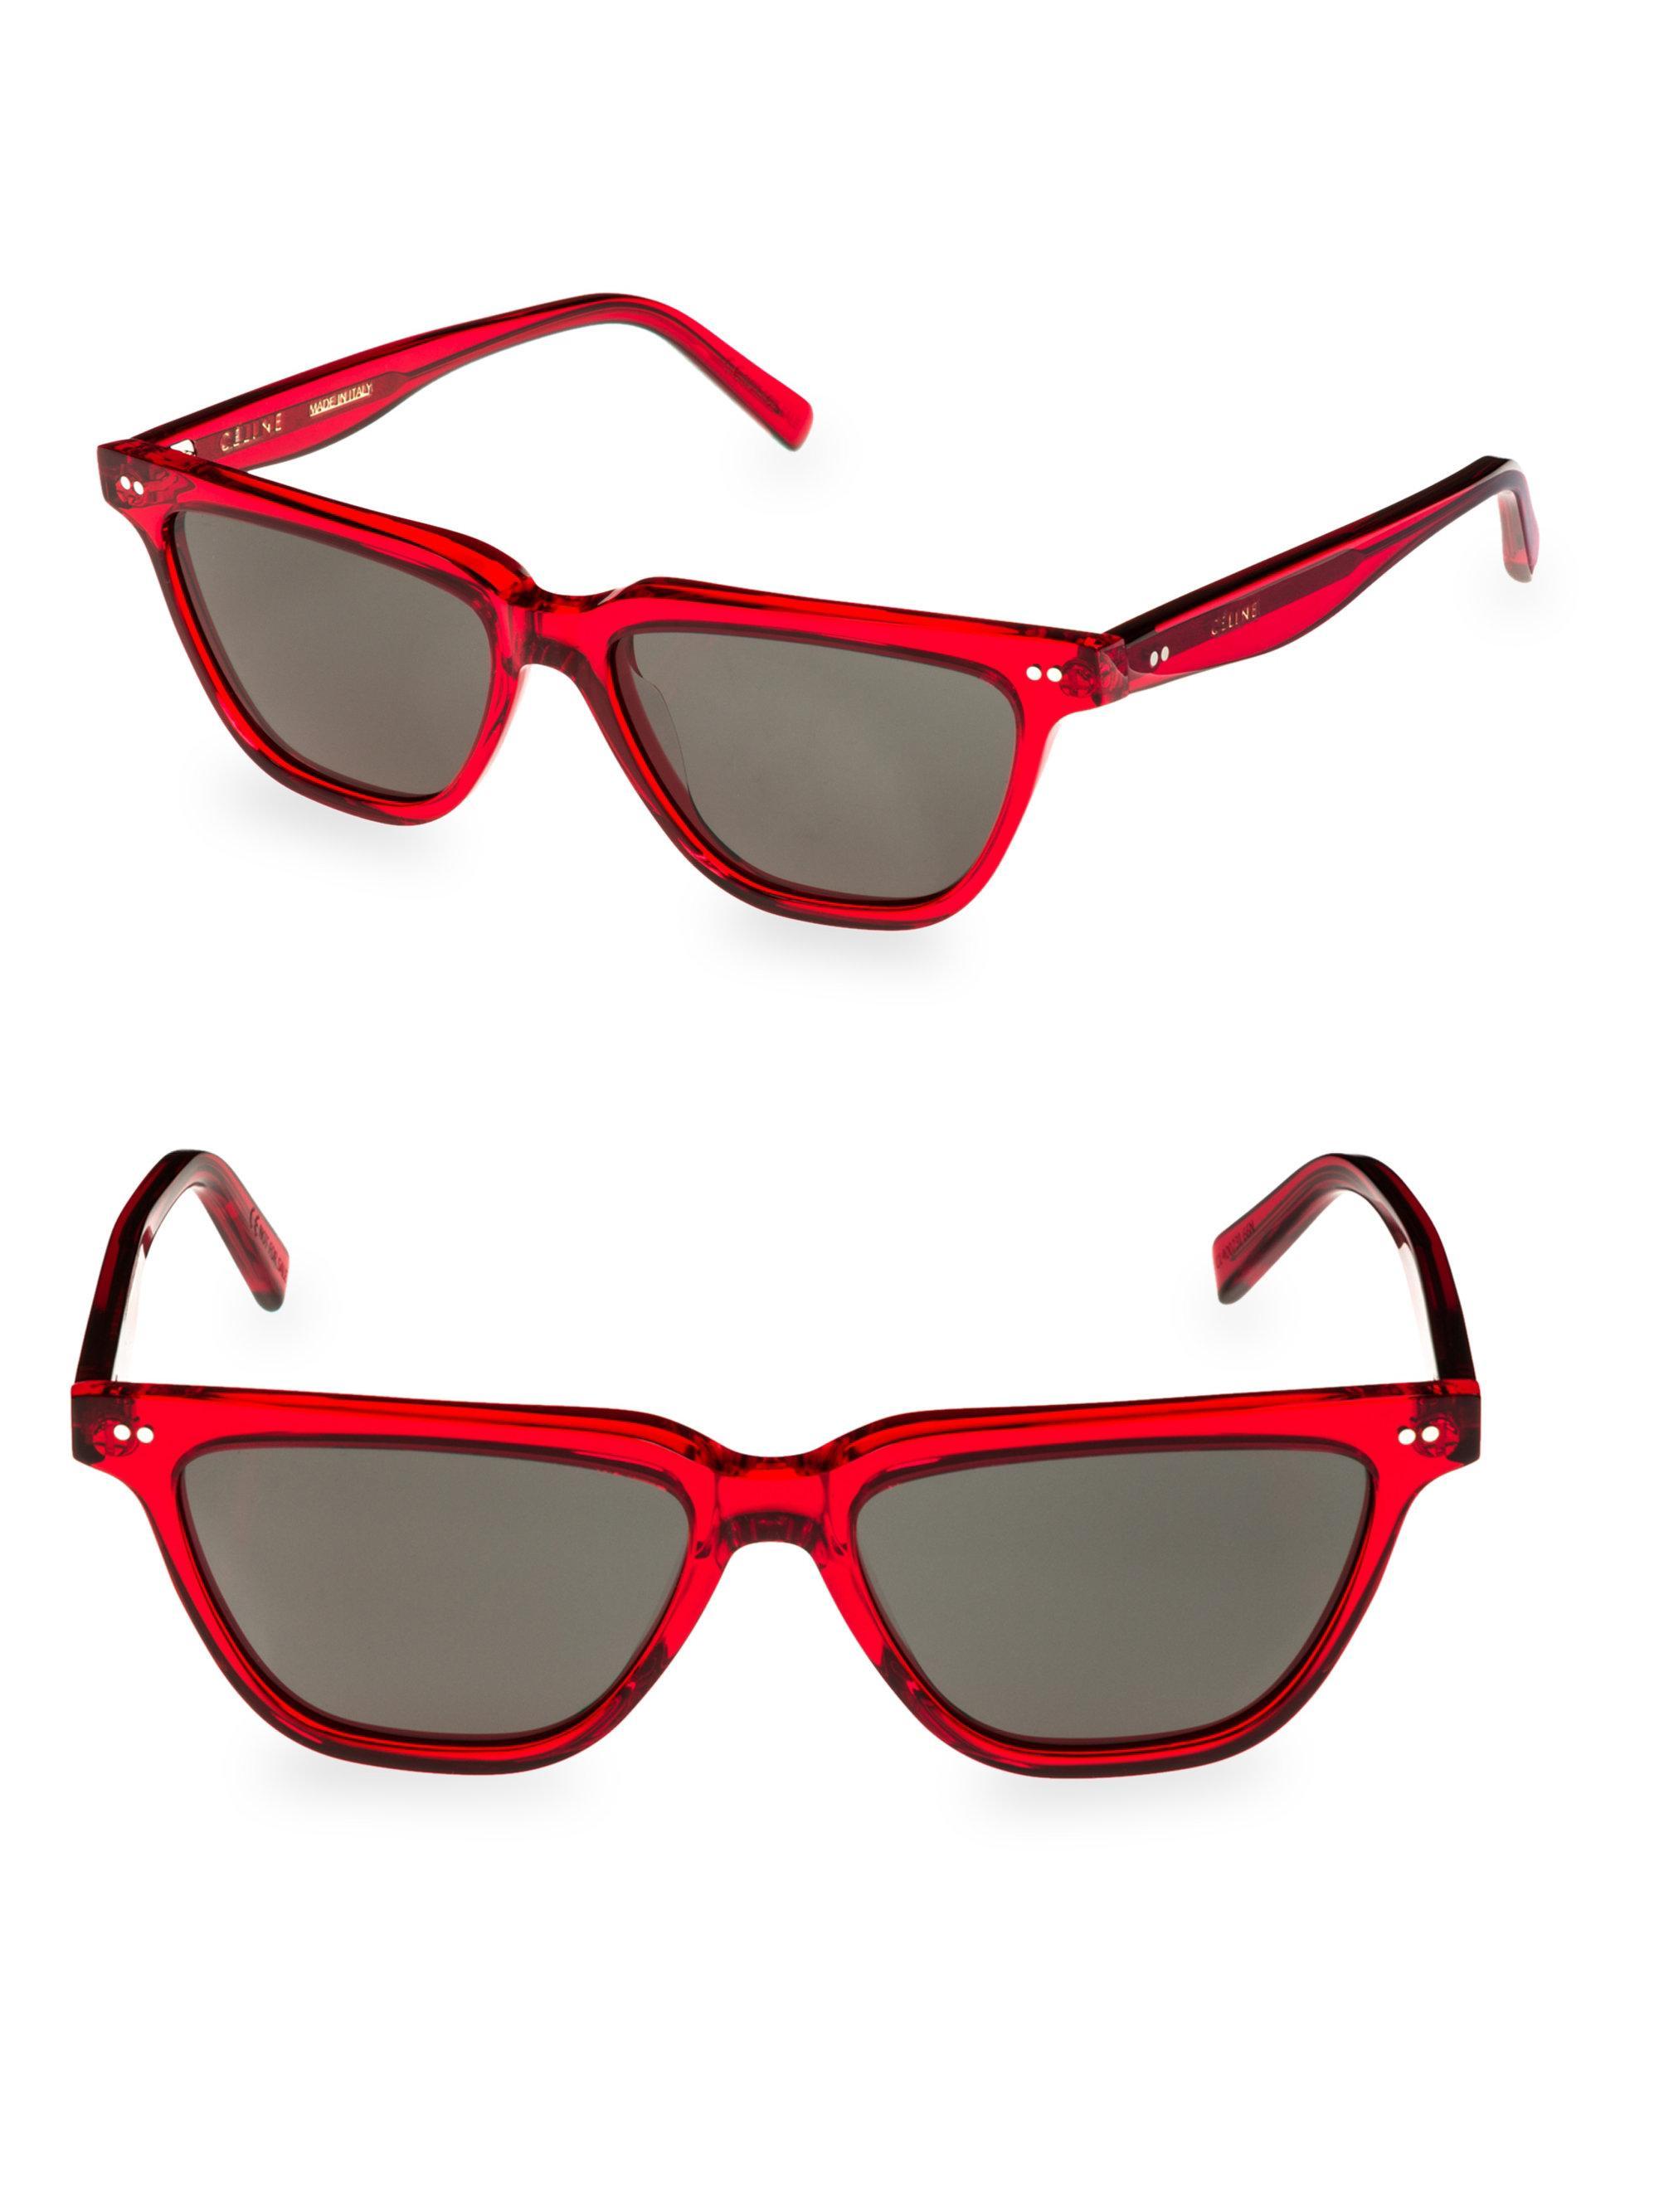 3c03def6f8800 Céline Flat Top Wayfarer Sunglasses in Red - Lyst